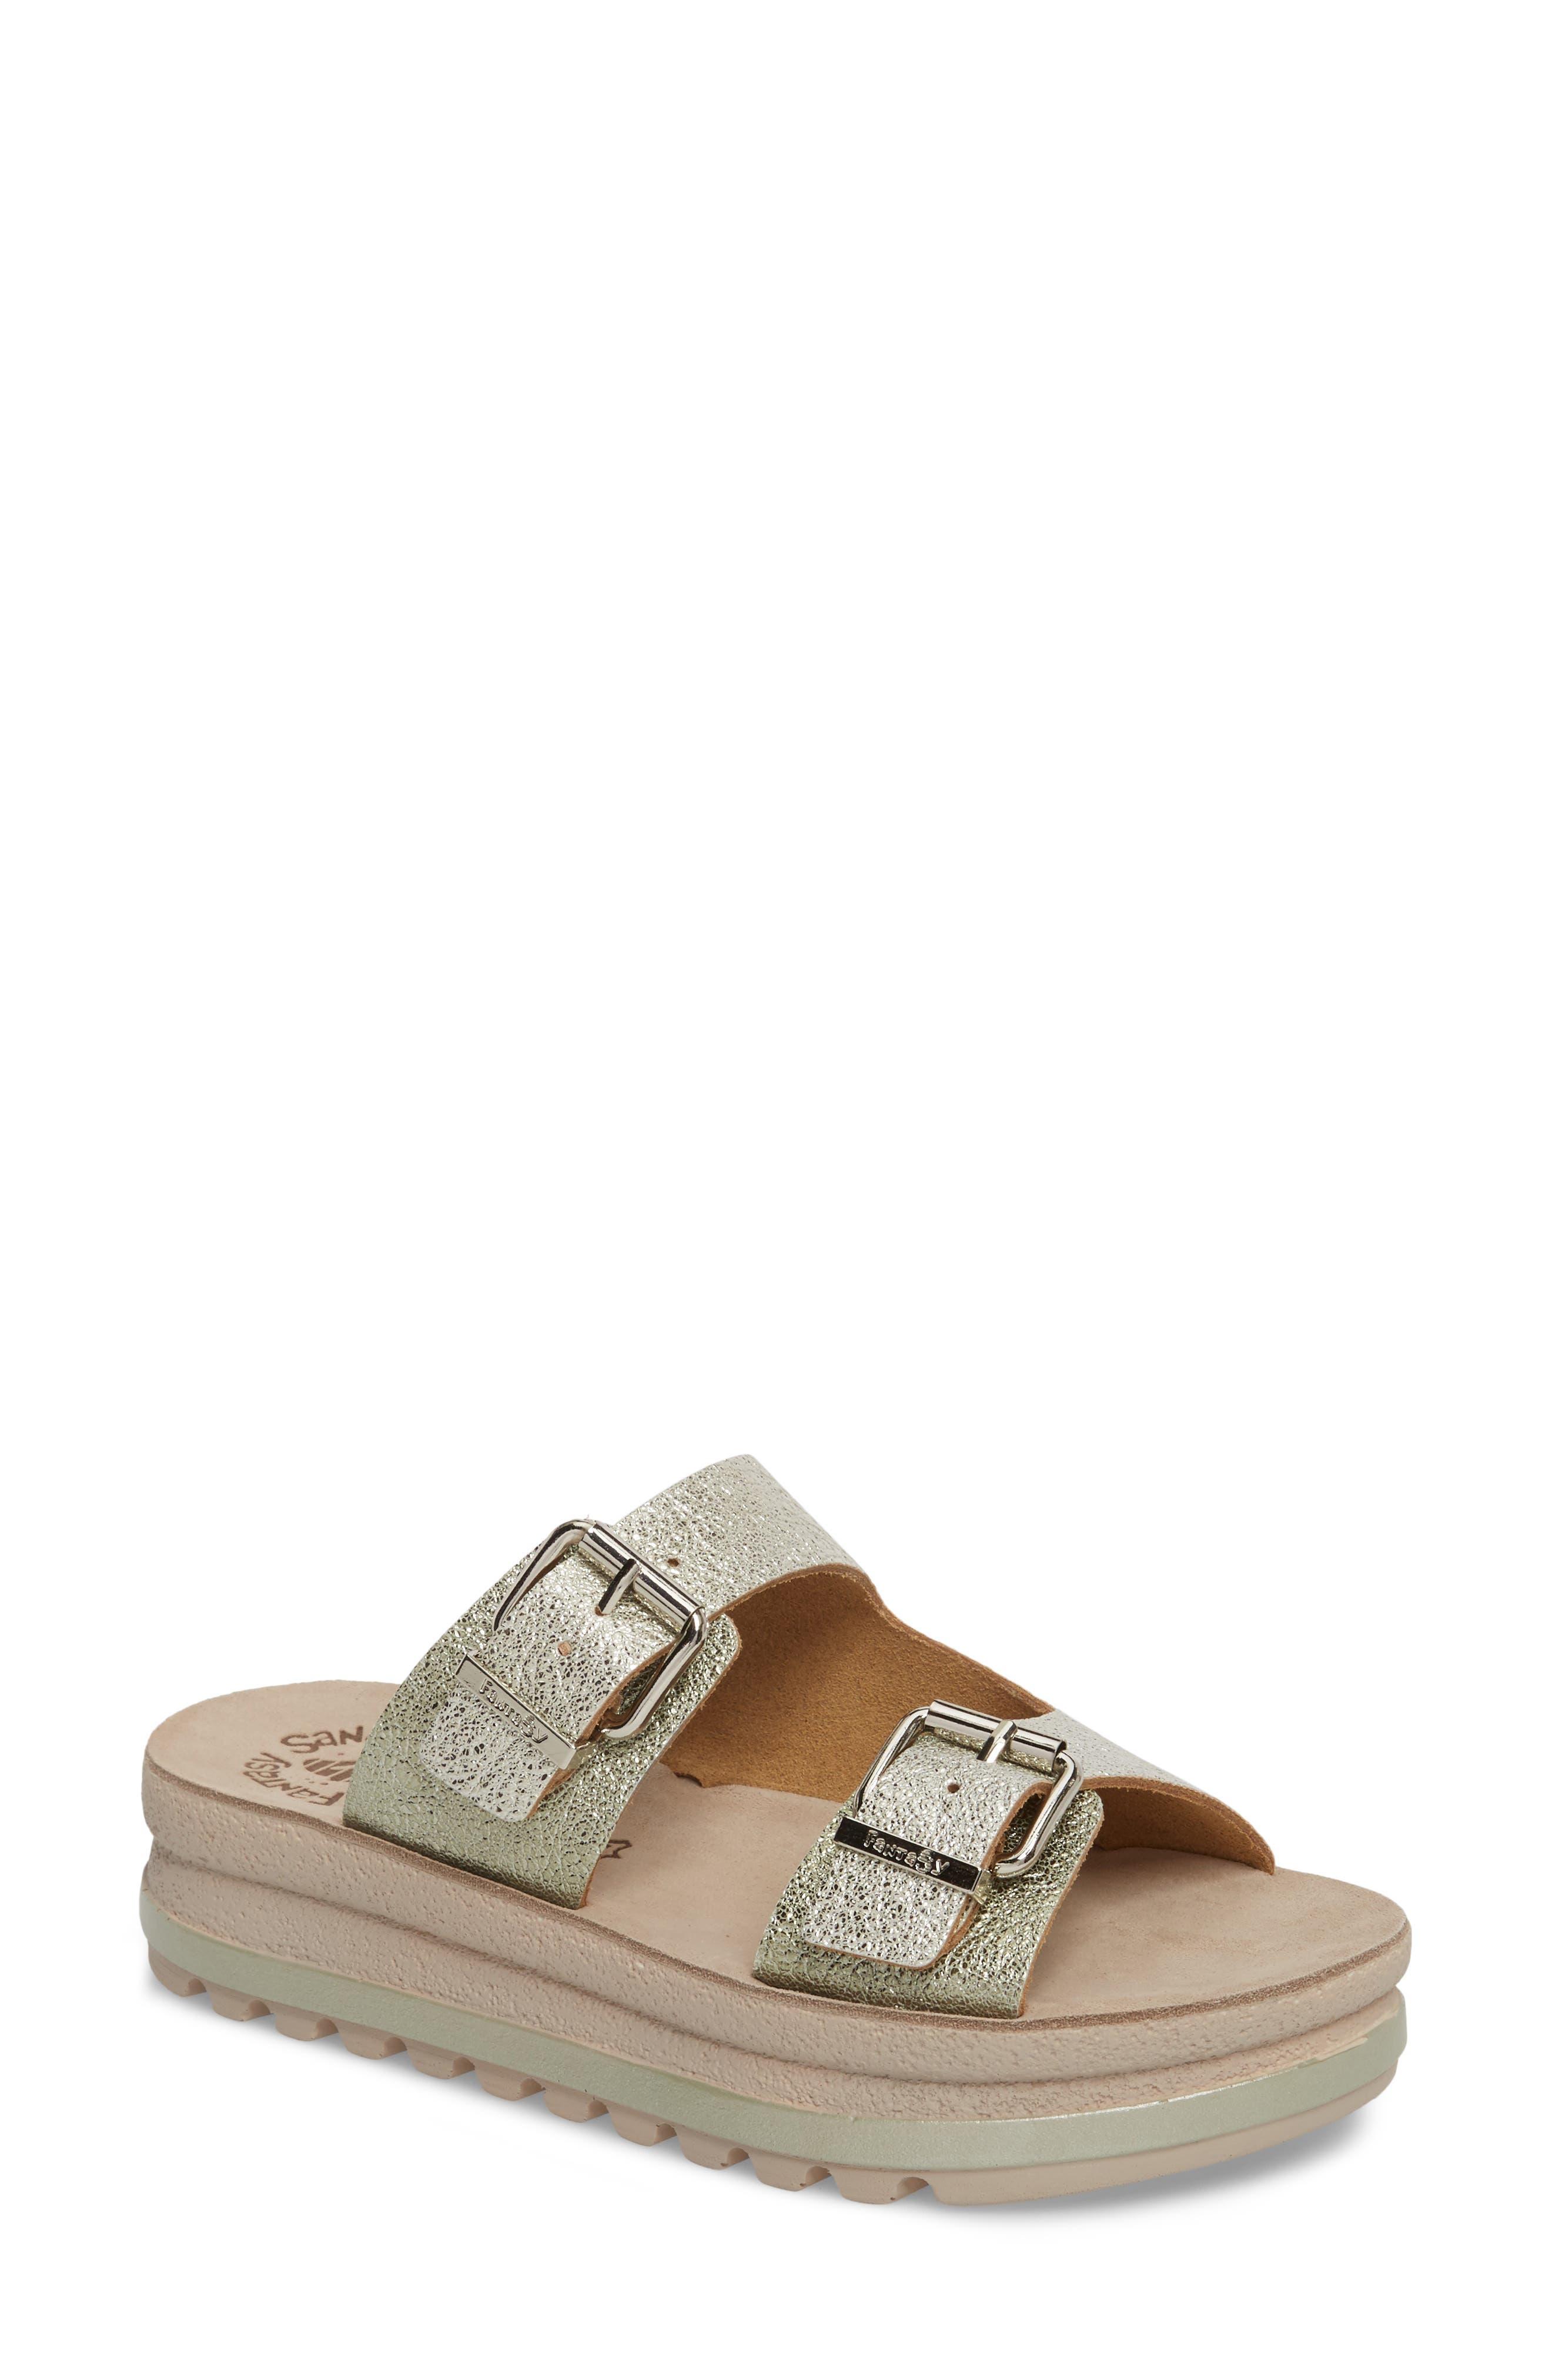 scarpe Steals  Donna grigio Slide Sandalos Sandalos Sandalos   Nordstrom 797eec